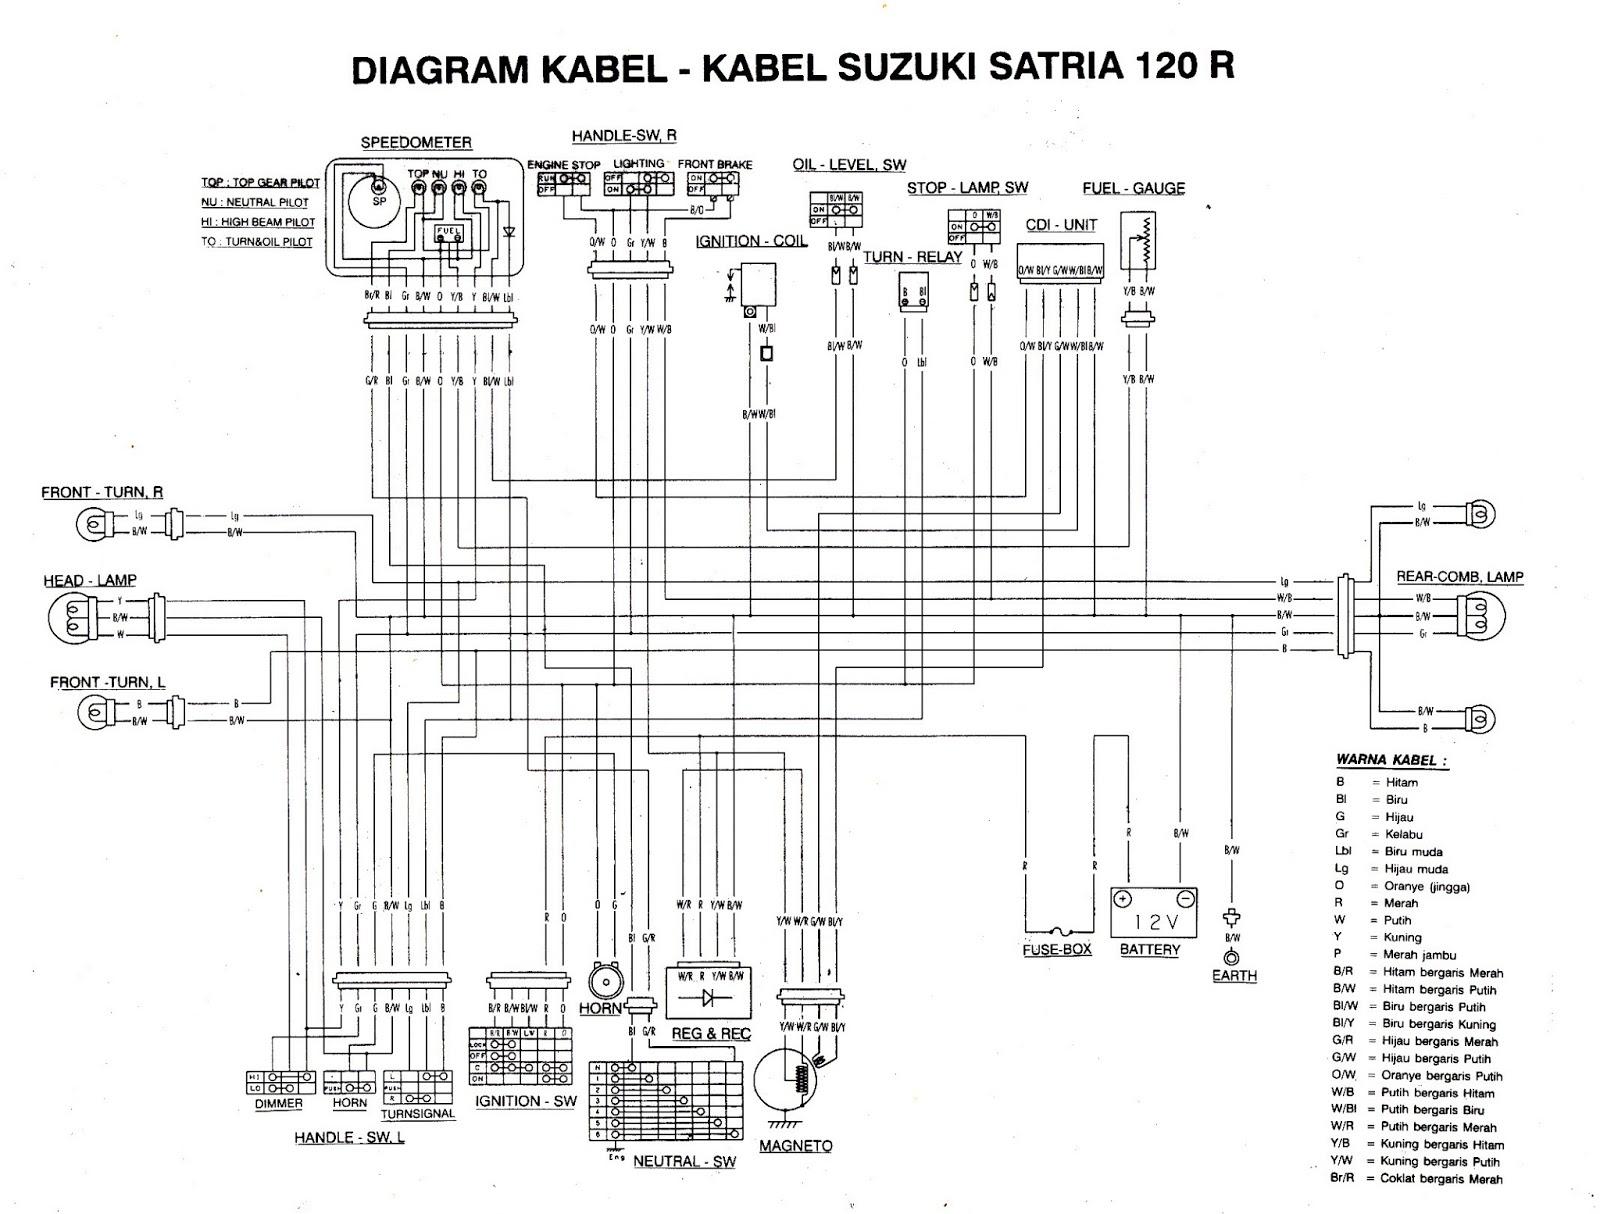 BLESS FOR MY THIRTEEN: Skema Kelistrikan Suzuki Satria 120 S ... on